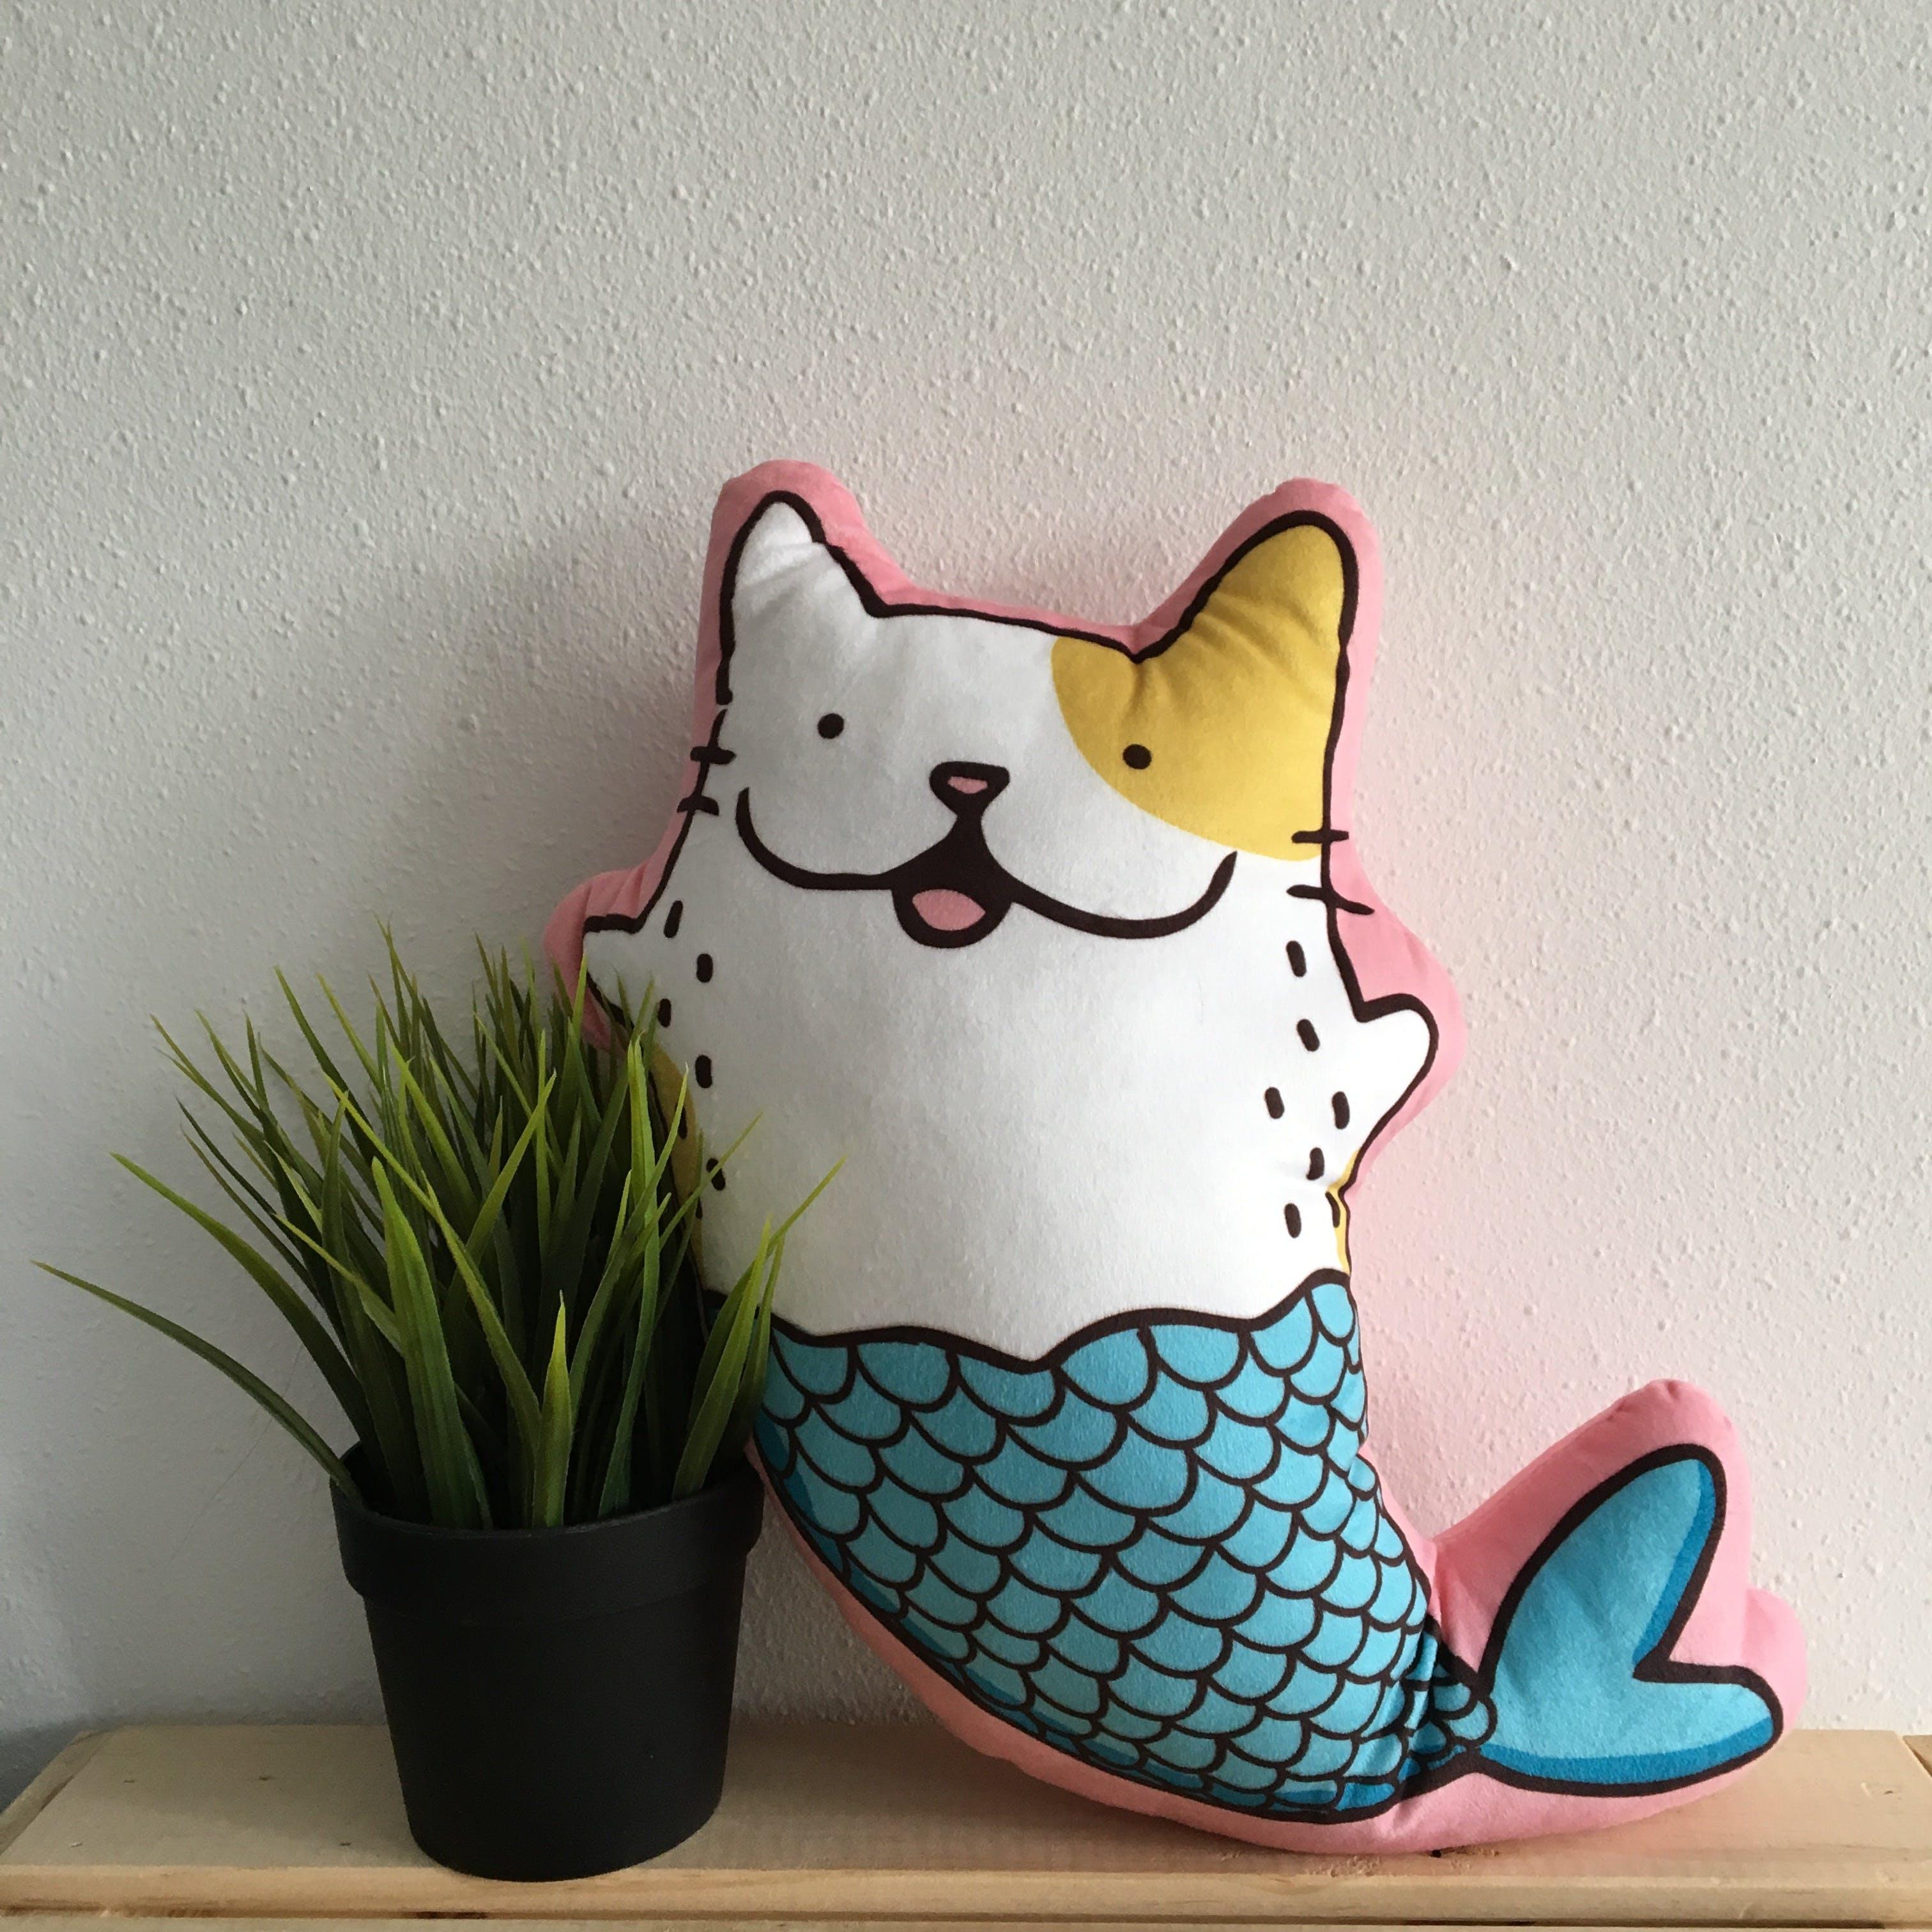 Mermaid Cat Pillow Beside Plant